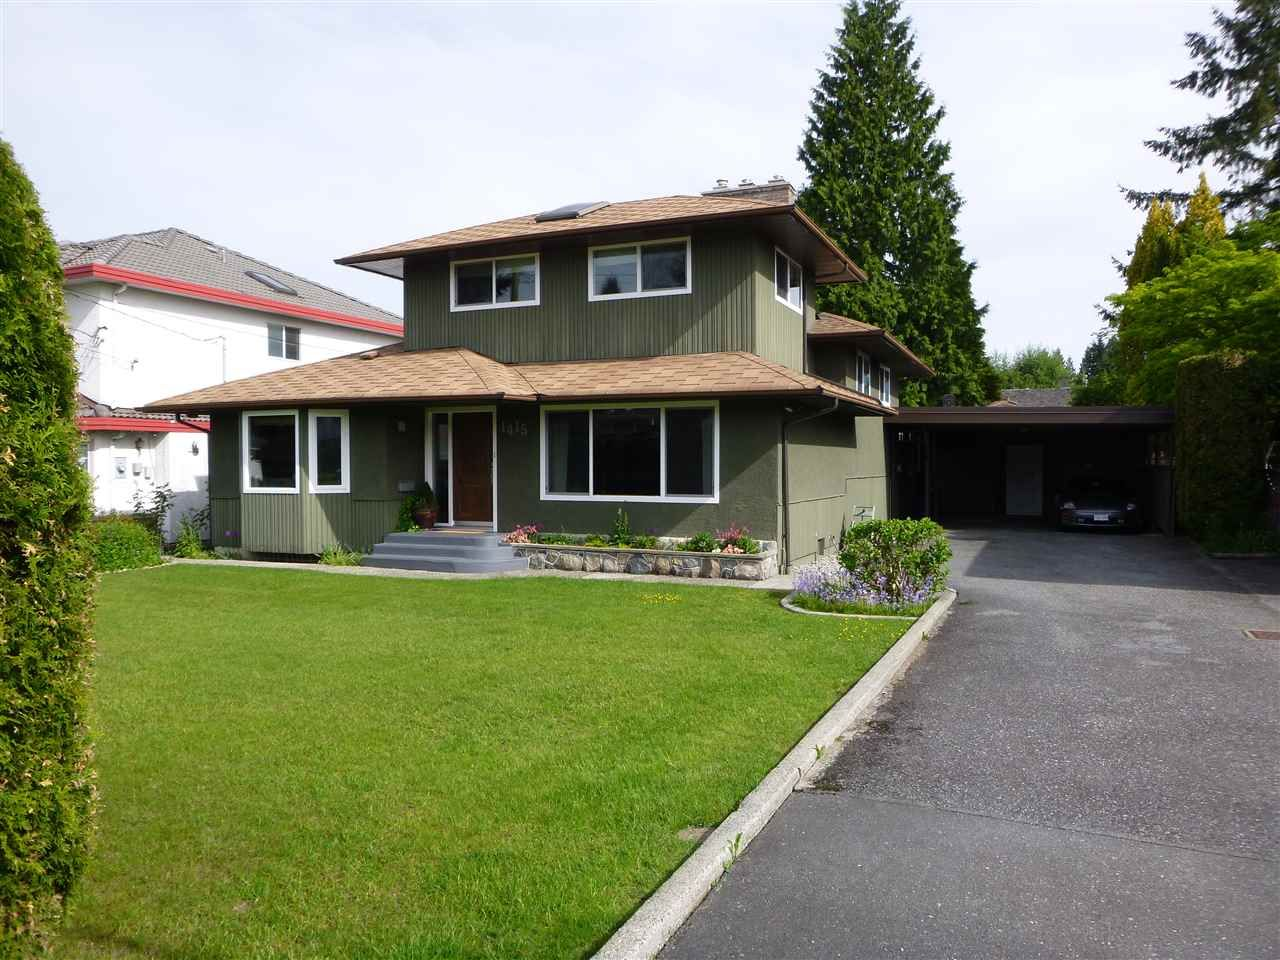 Main Photo: 1415 REGAN Avenue in Coquitlam: Central Coquitlam House for sale : MLS®# R2019990